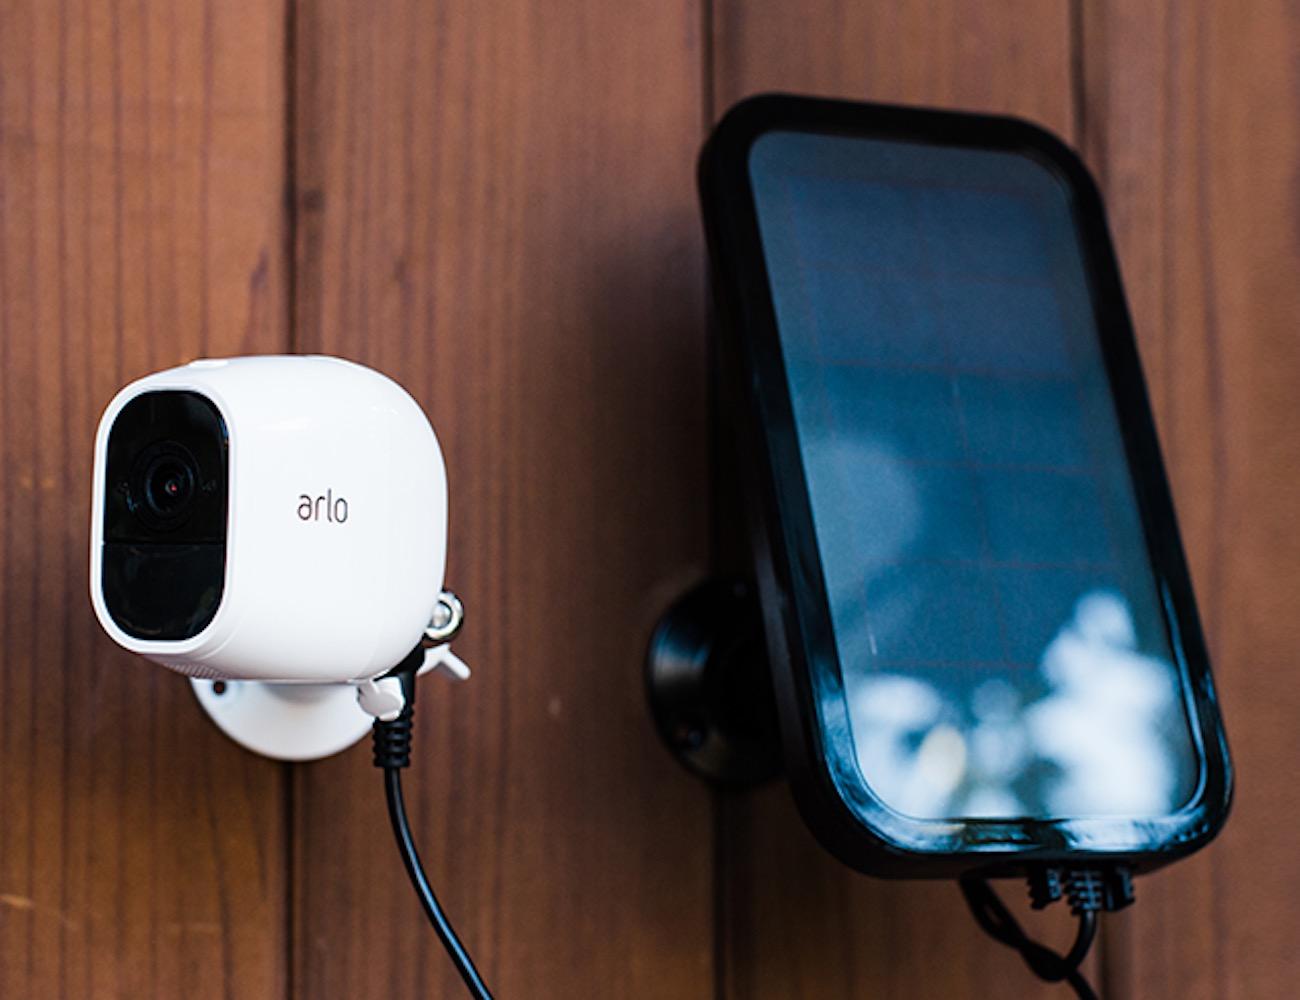 Arlo Pro 2 Smart HD Security Camera by NETGEAR